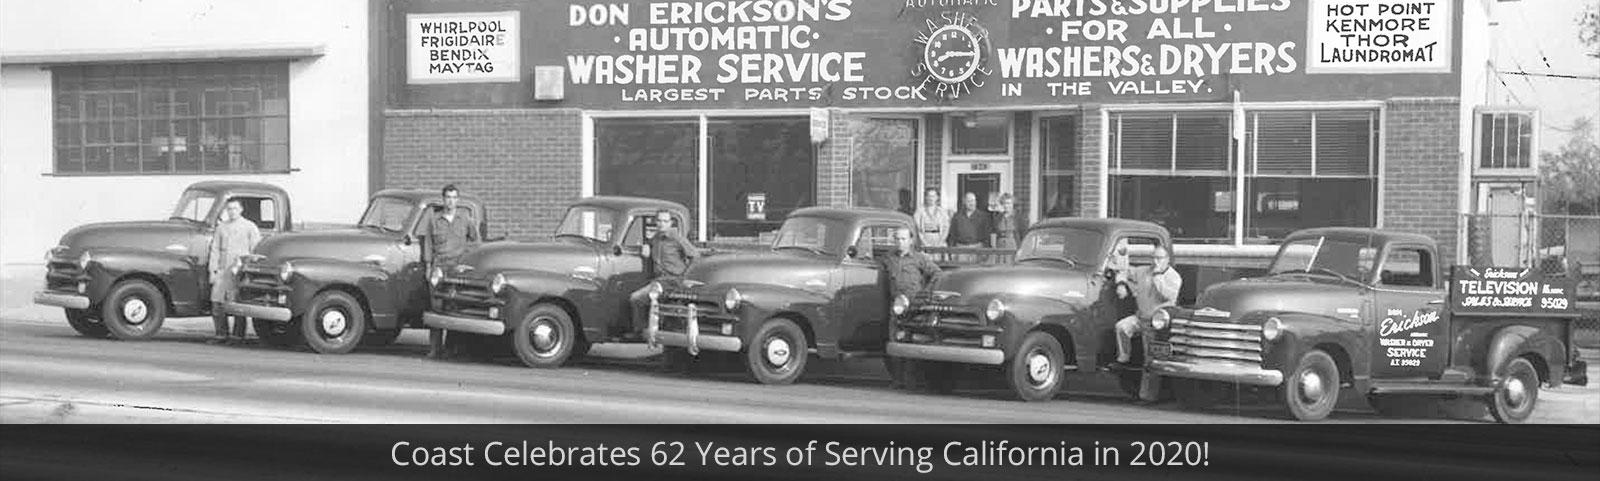 Coast Celebrates 62 Years of Serving California